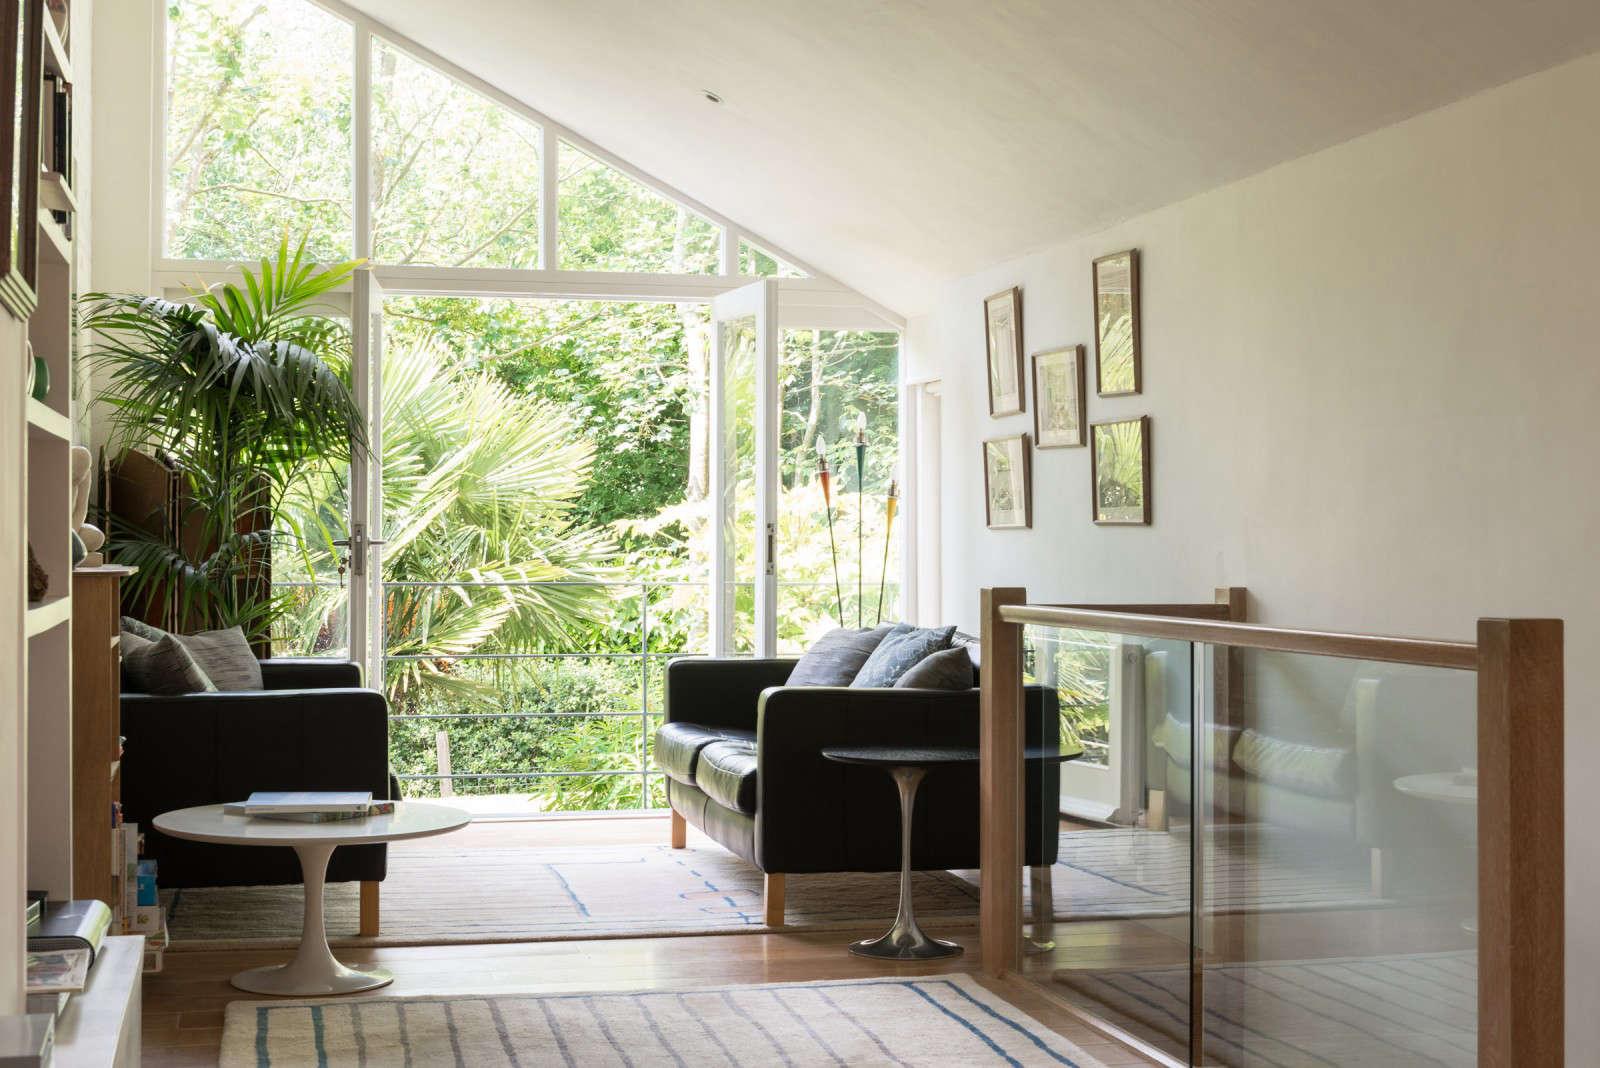 greenhouse-conversion-kent-themodernhouse-houseplant-3